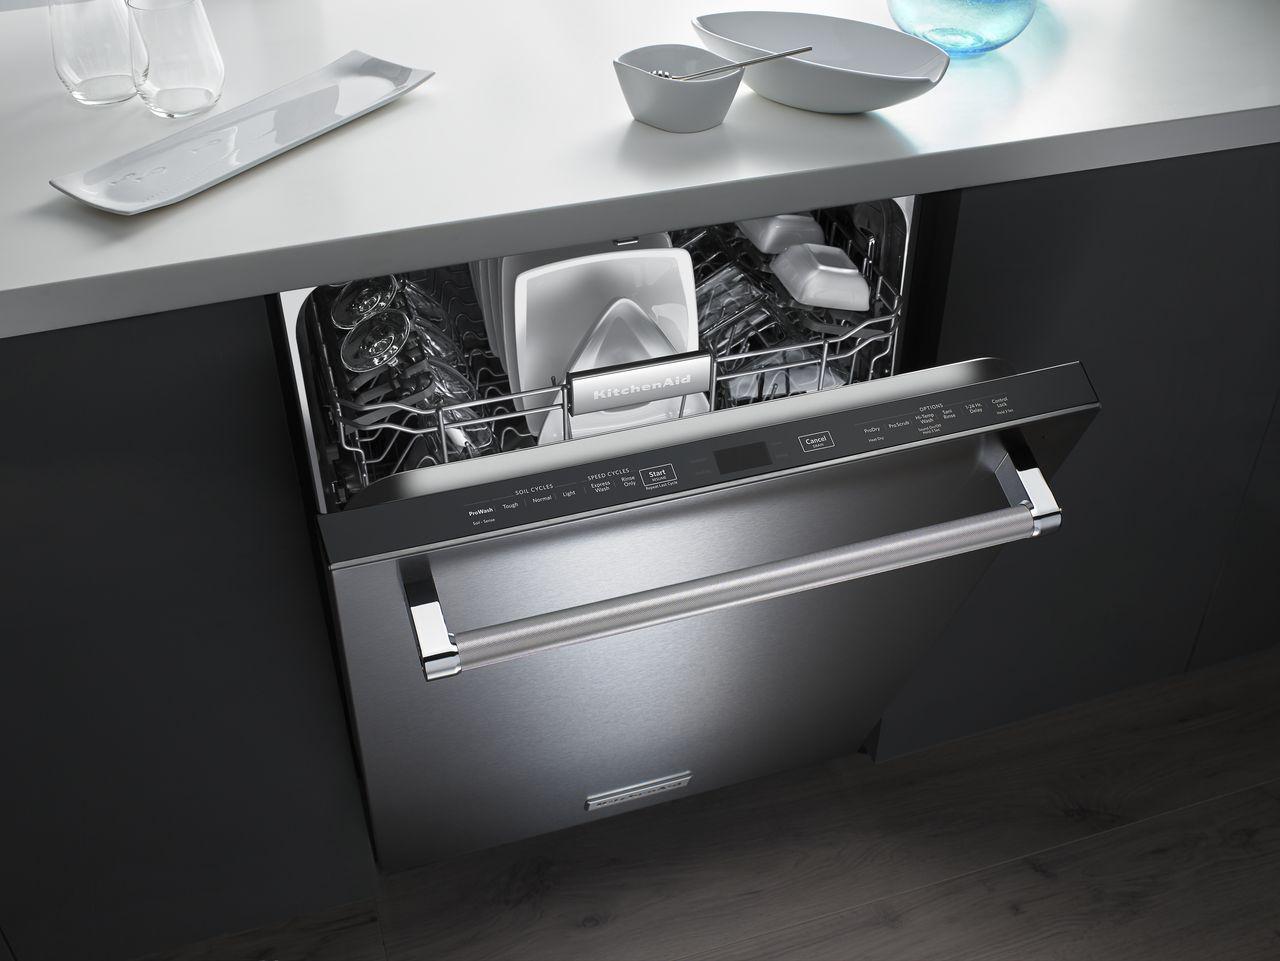 Kitchenaid stainless steel dishwasher